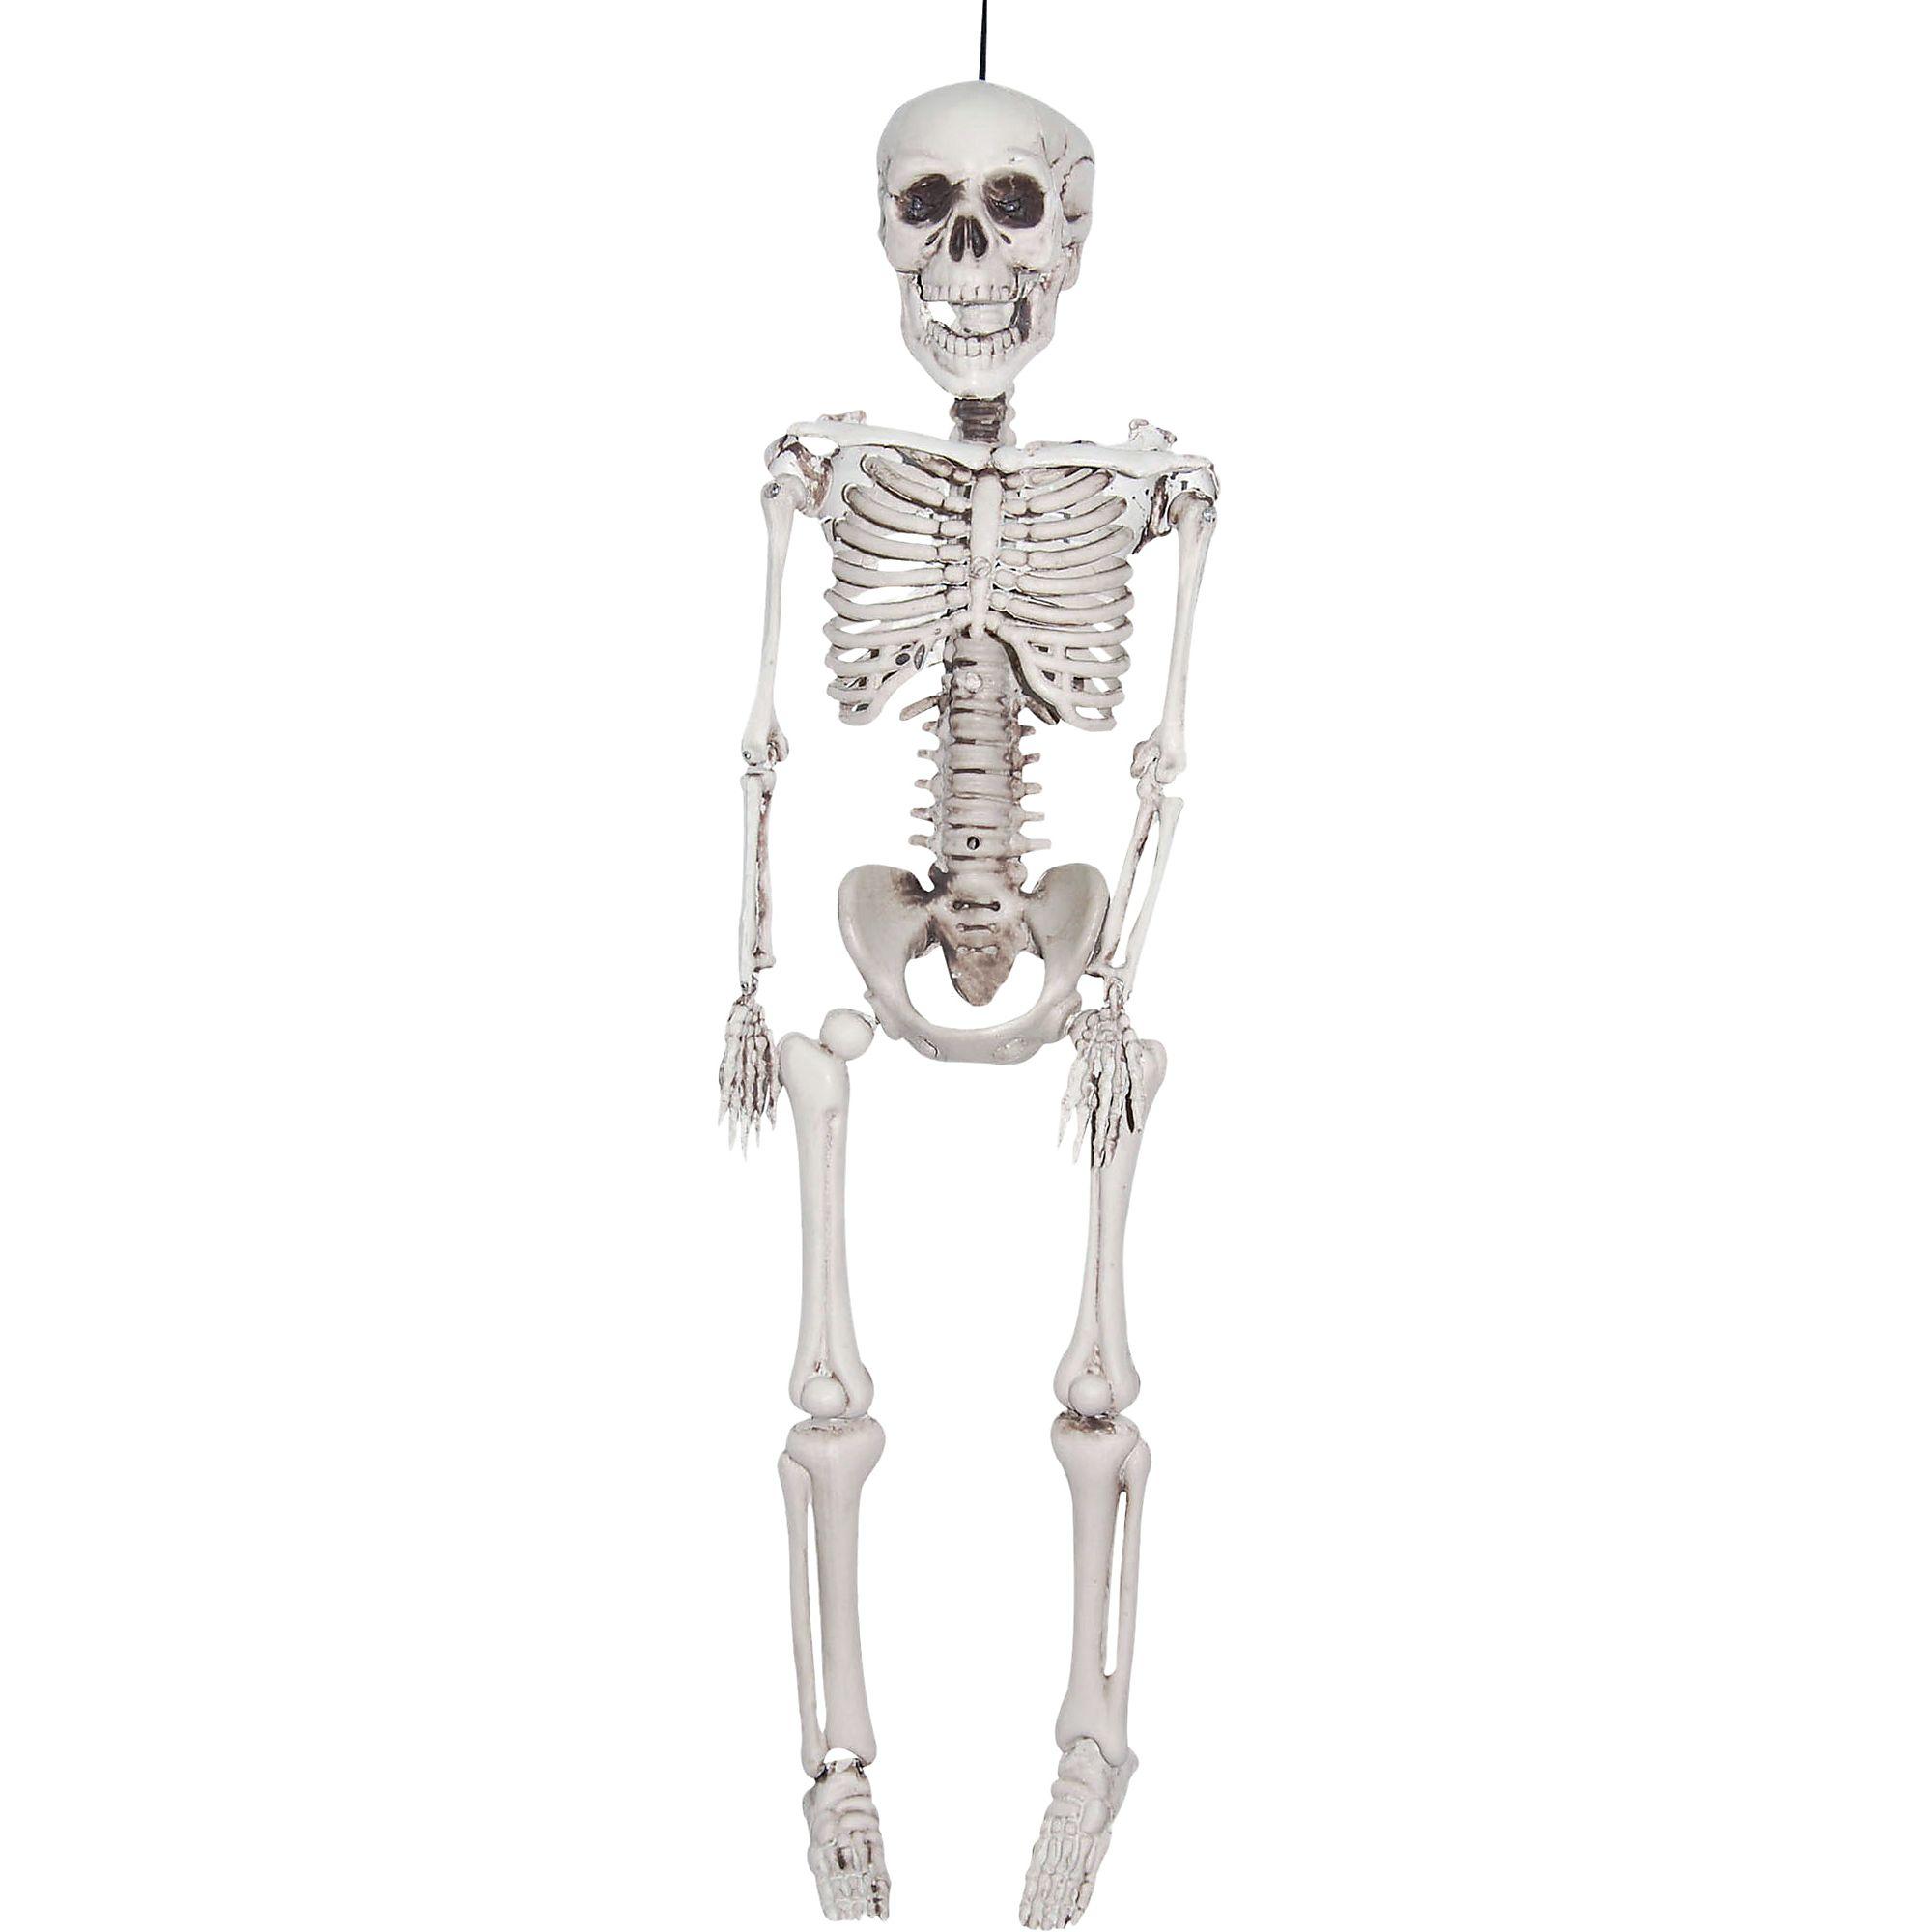 Realistic Hanging Skeleton 35 Inches Plastic Prop Bones